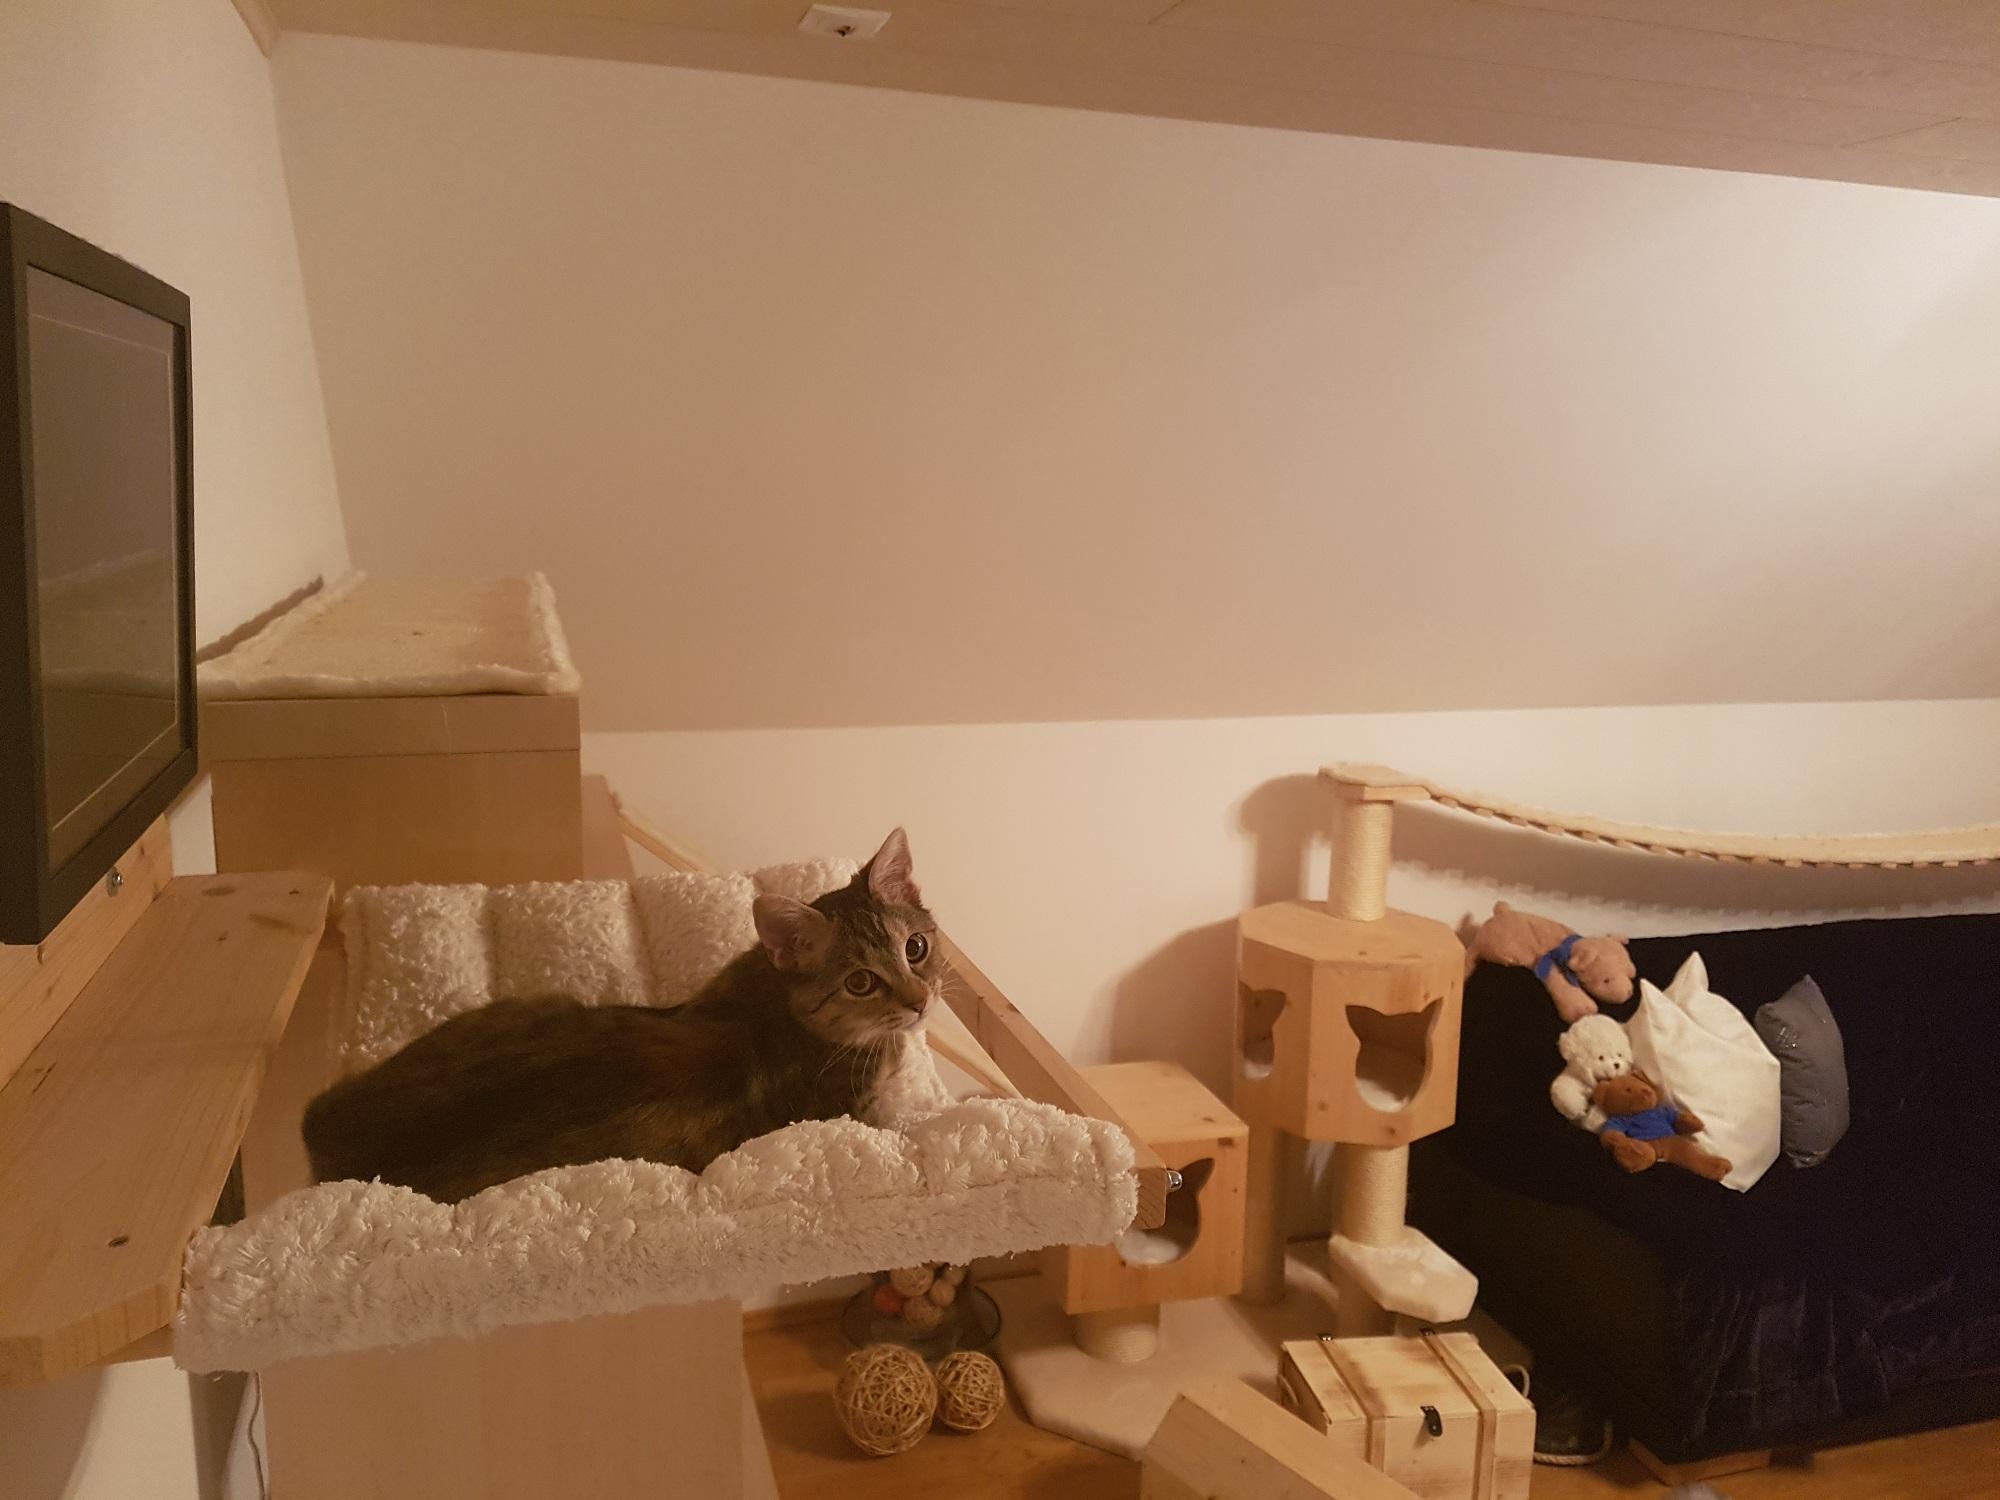 kratzbaum an der wand kratzbaum an der wand. Black Bedroom Furniture Sets. Home Design Ideas